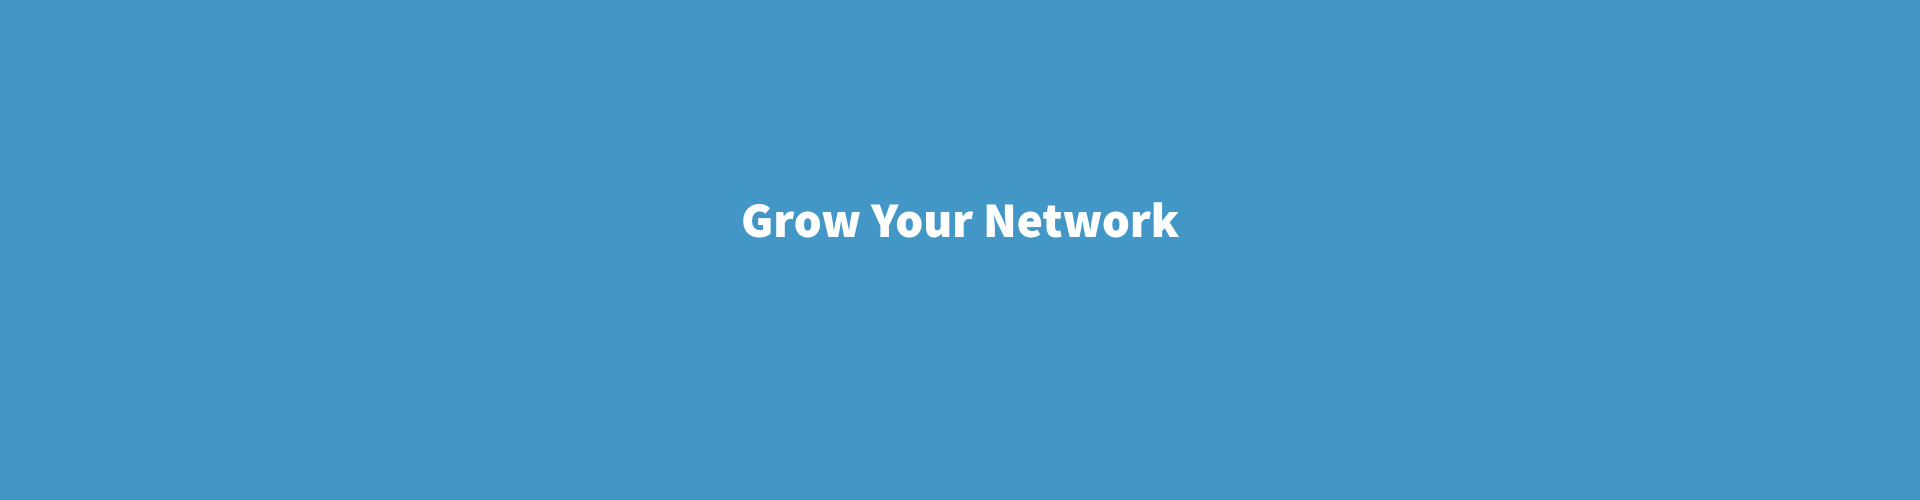 network.001.jpeg